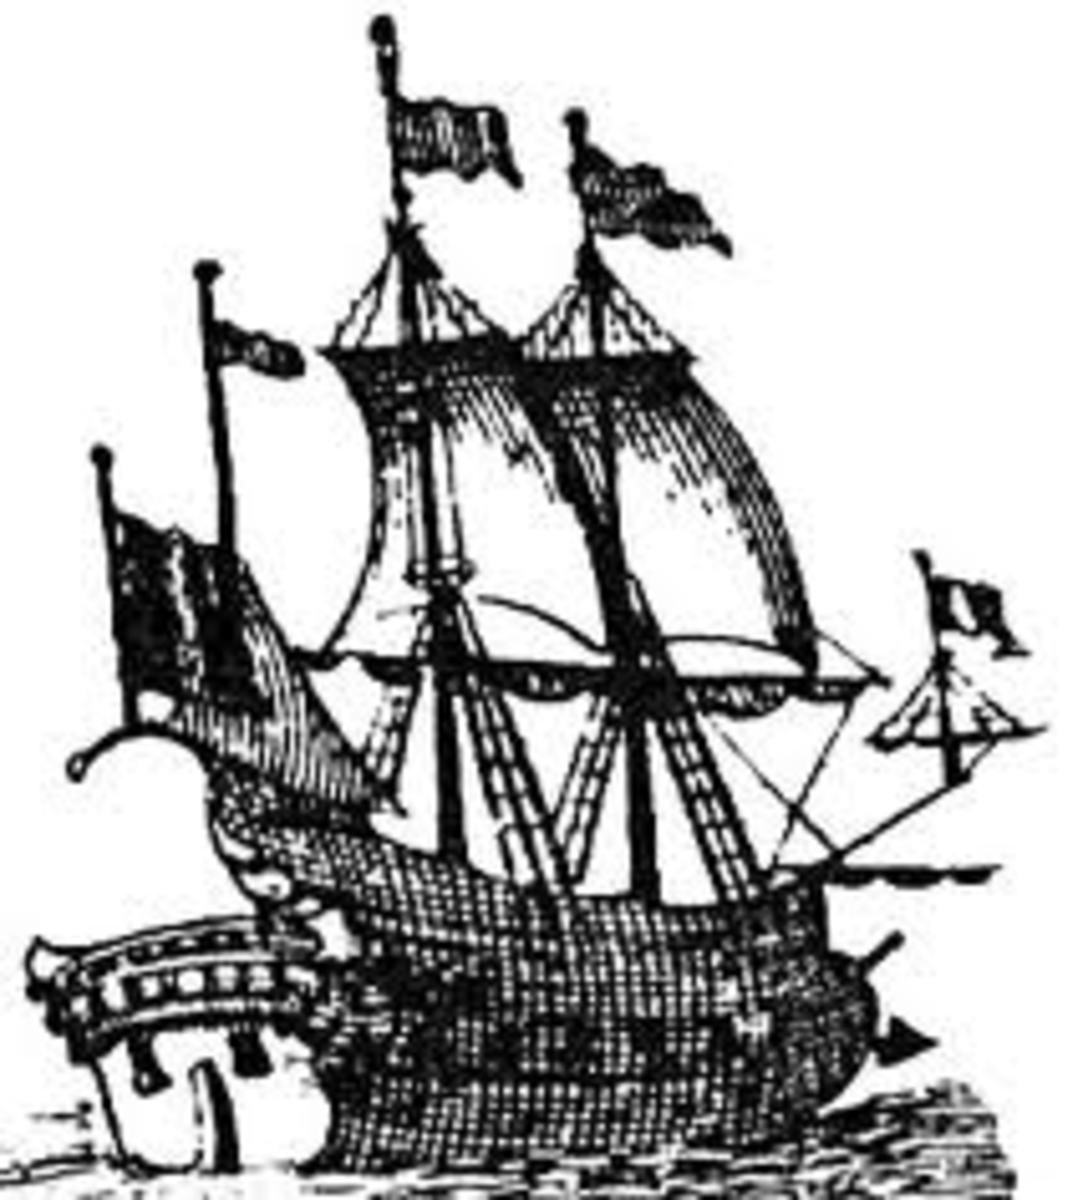 Pirate ship